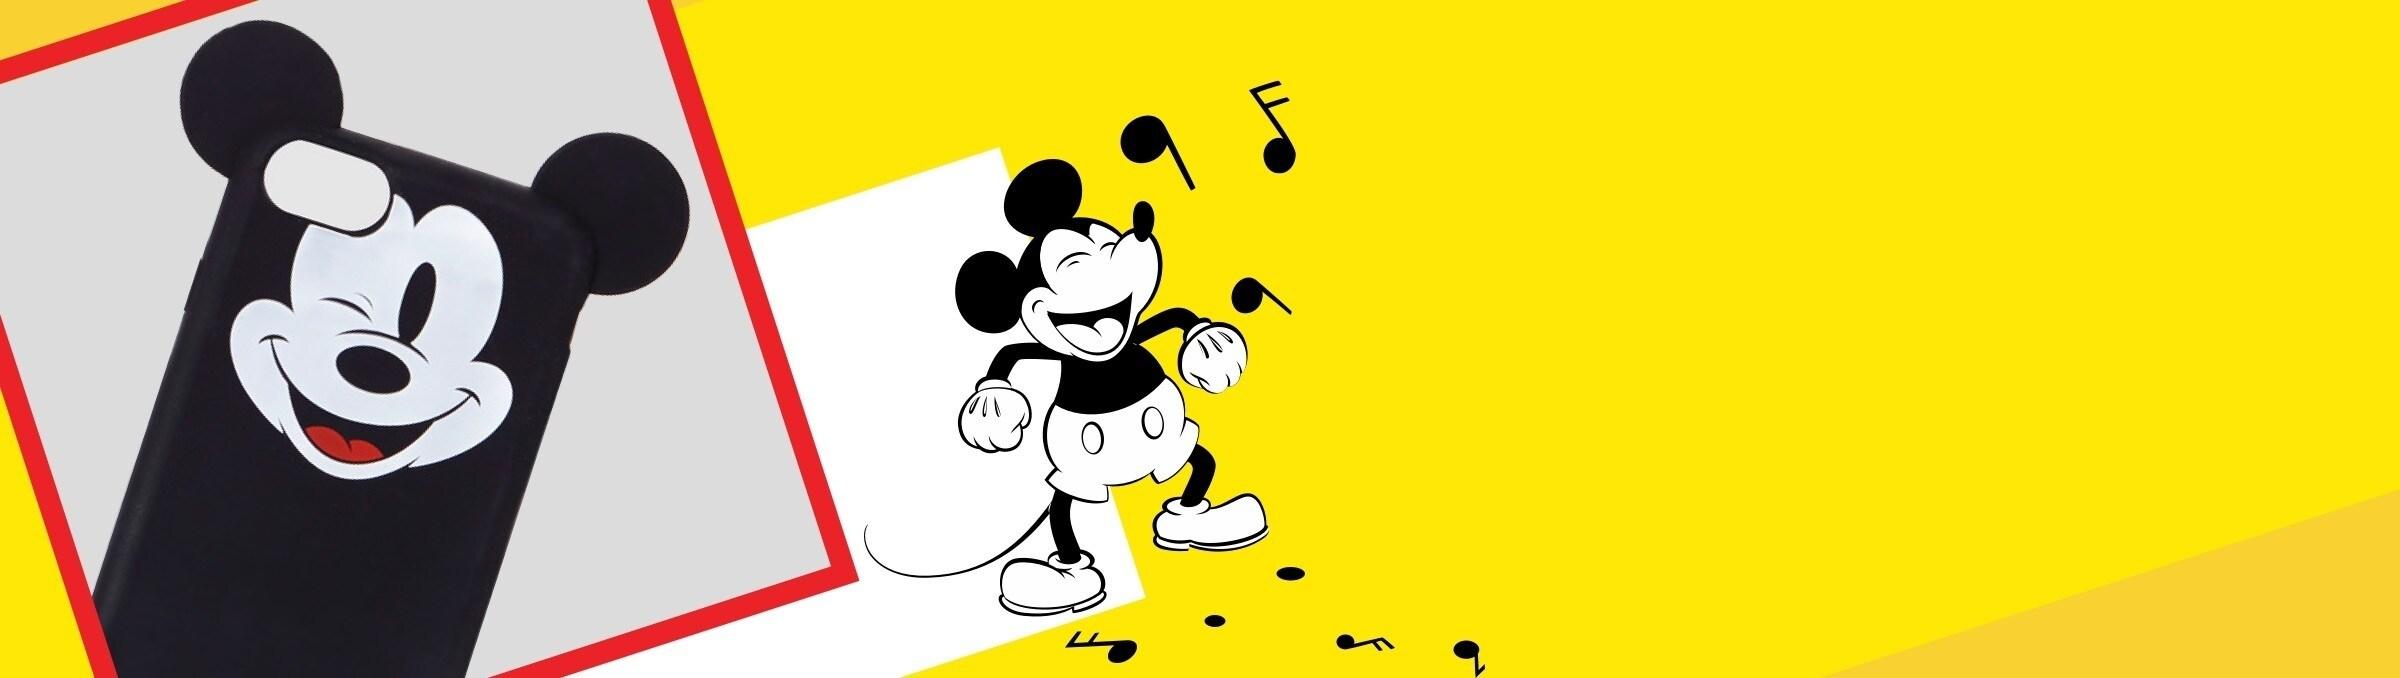 shopDisney | Mickey 90 Innovation 4 Hero